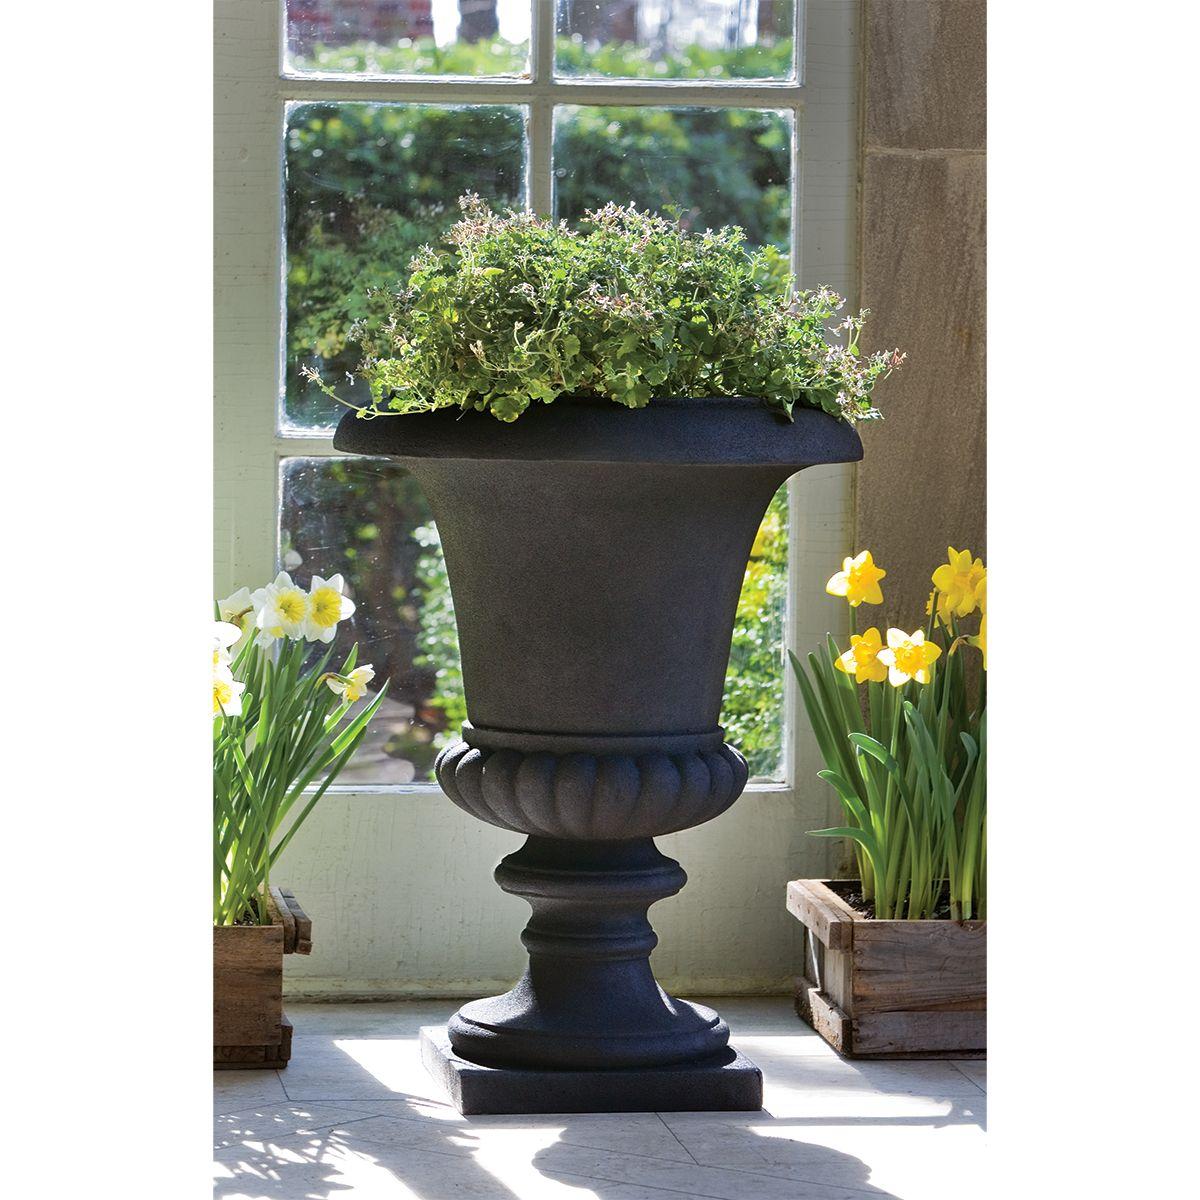 Morganna Lite Urn in Onyx   Garden & Patio Planter From Thos. Baker